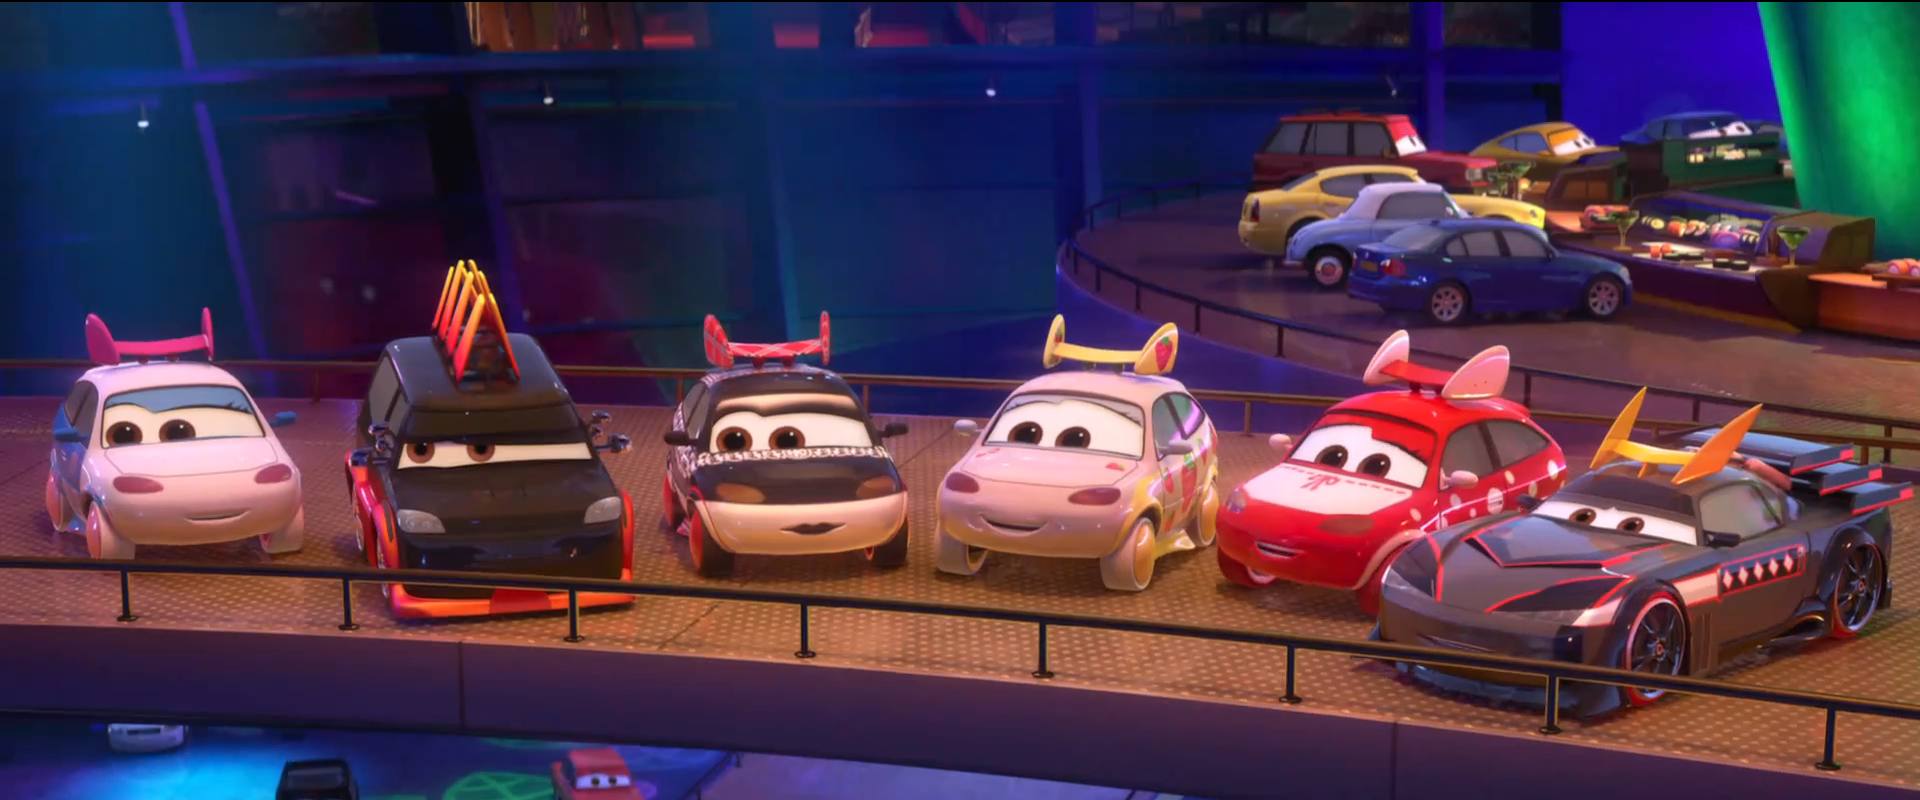 cars 2 trivia pixar wiki fandom powered by wikia. Black Bedroom Furniture Sets. Home Design Ideas